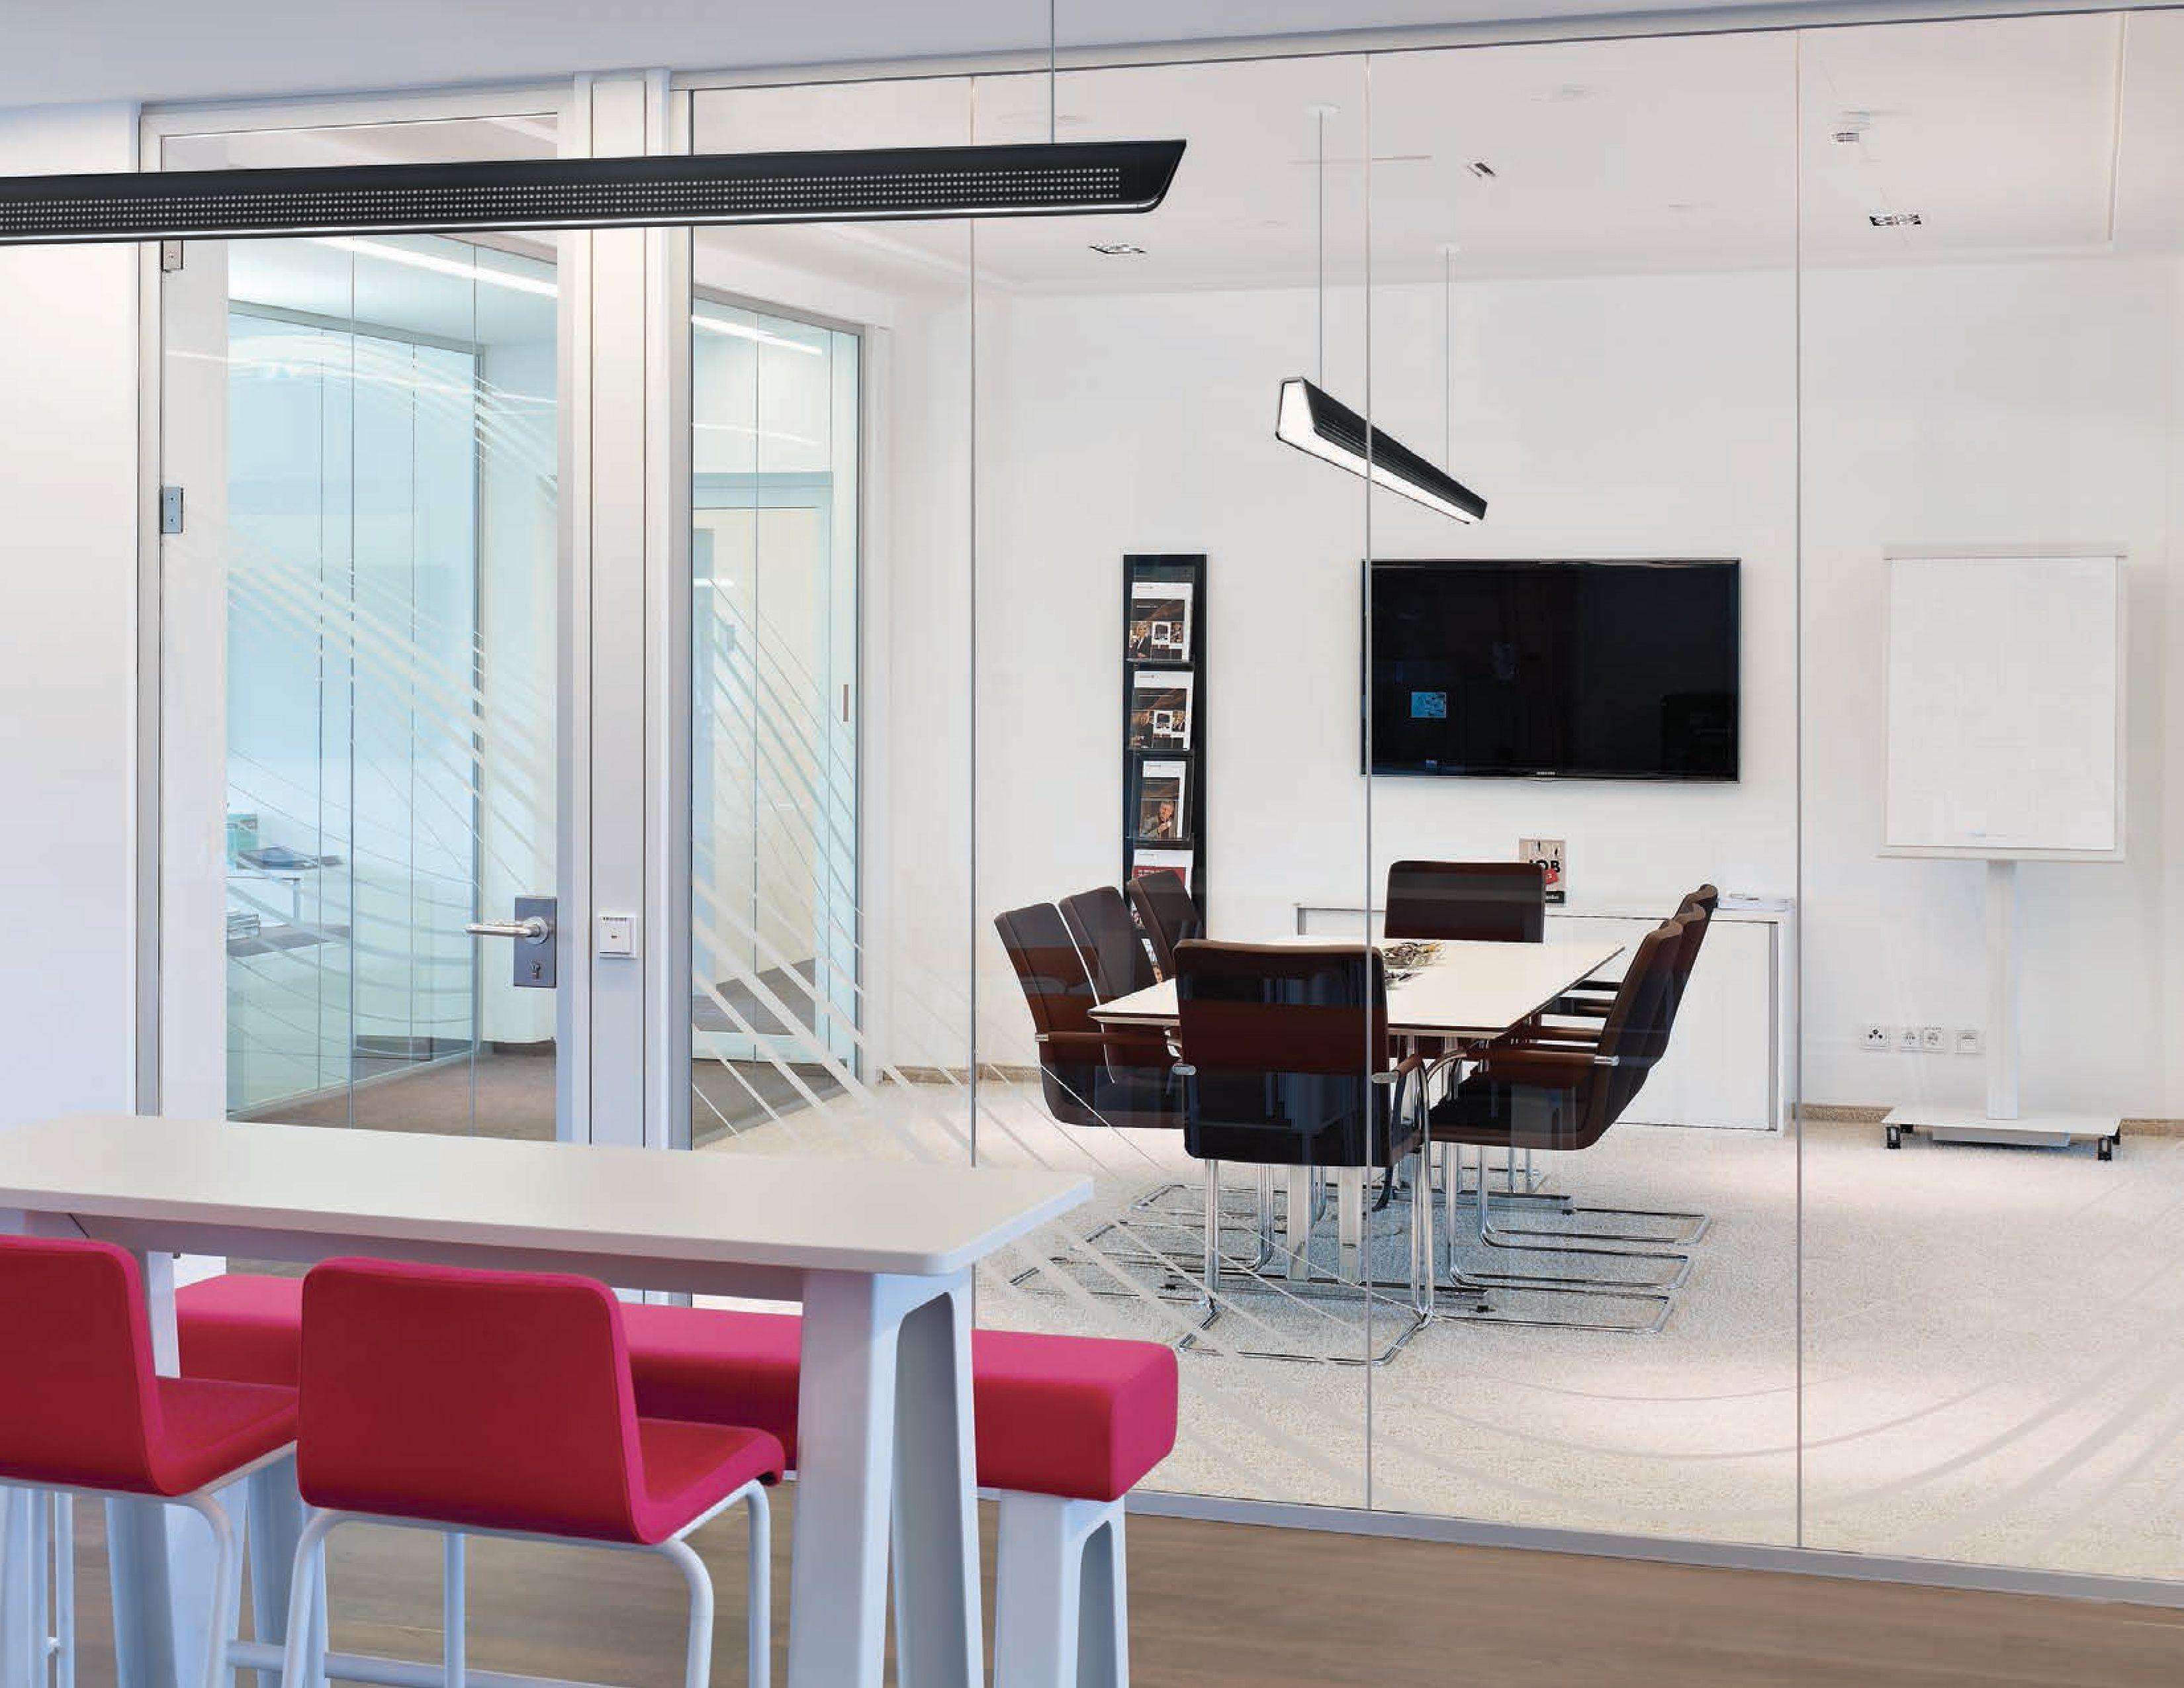 Philips Ledalite 1201 Jump Led Linear Pendant Light Fixture Ideal Office Lighting Wiring Diagram For Commercial